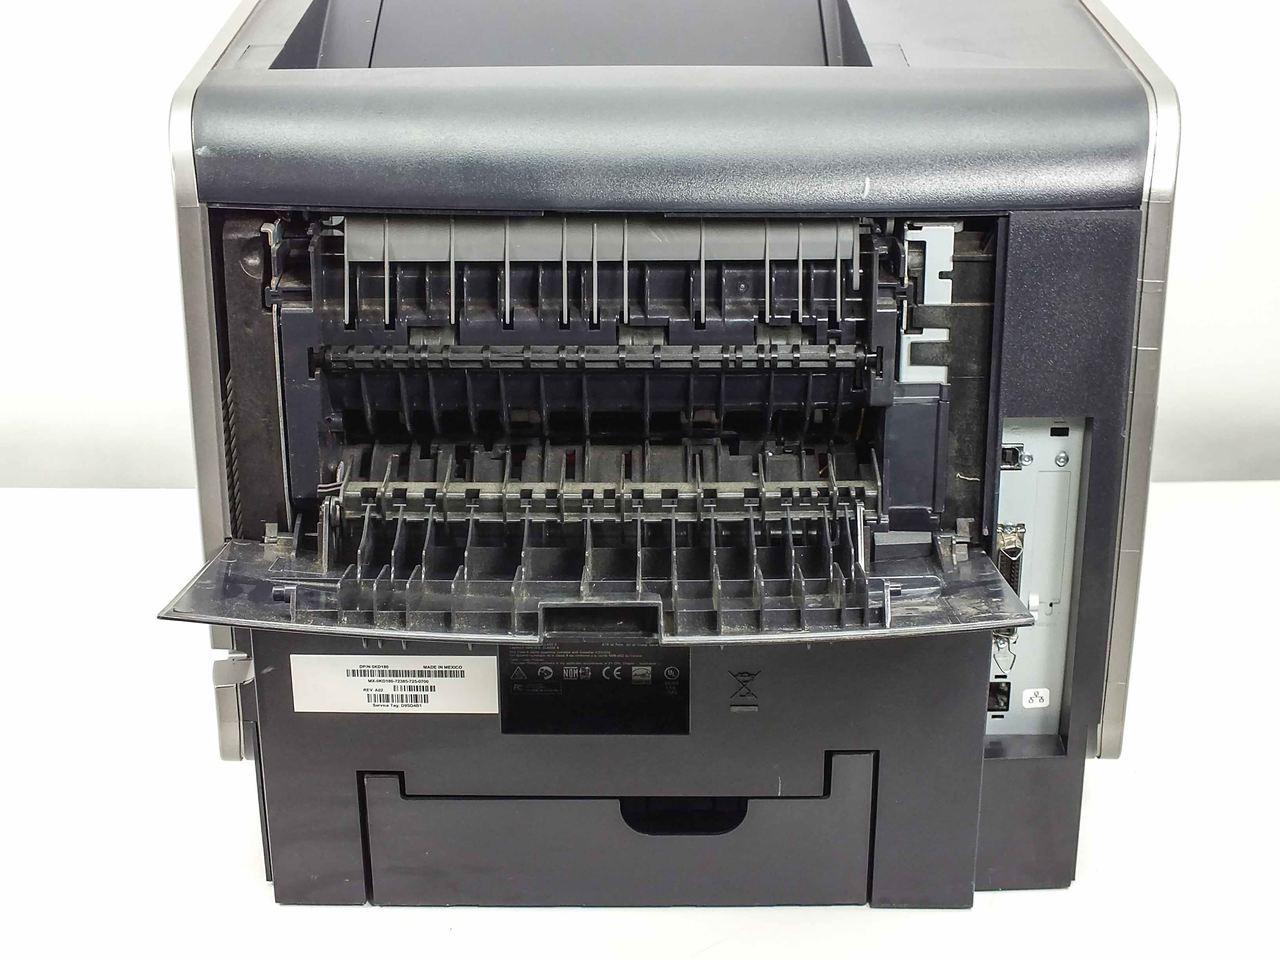 Dell 5210n Laser Printer